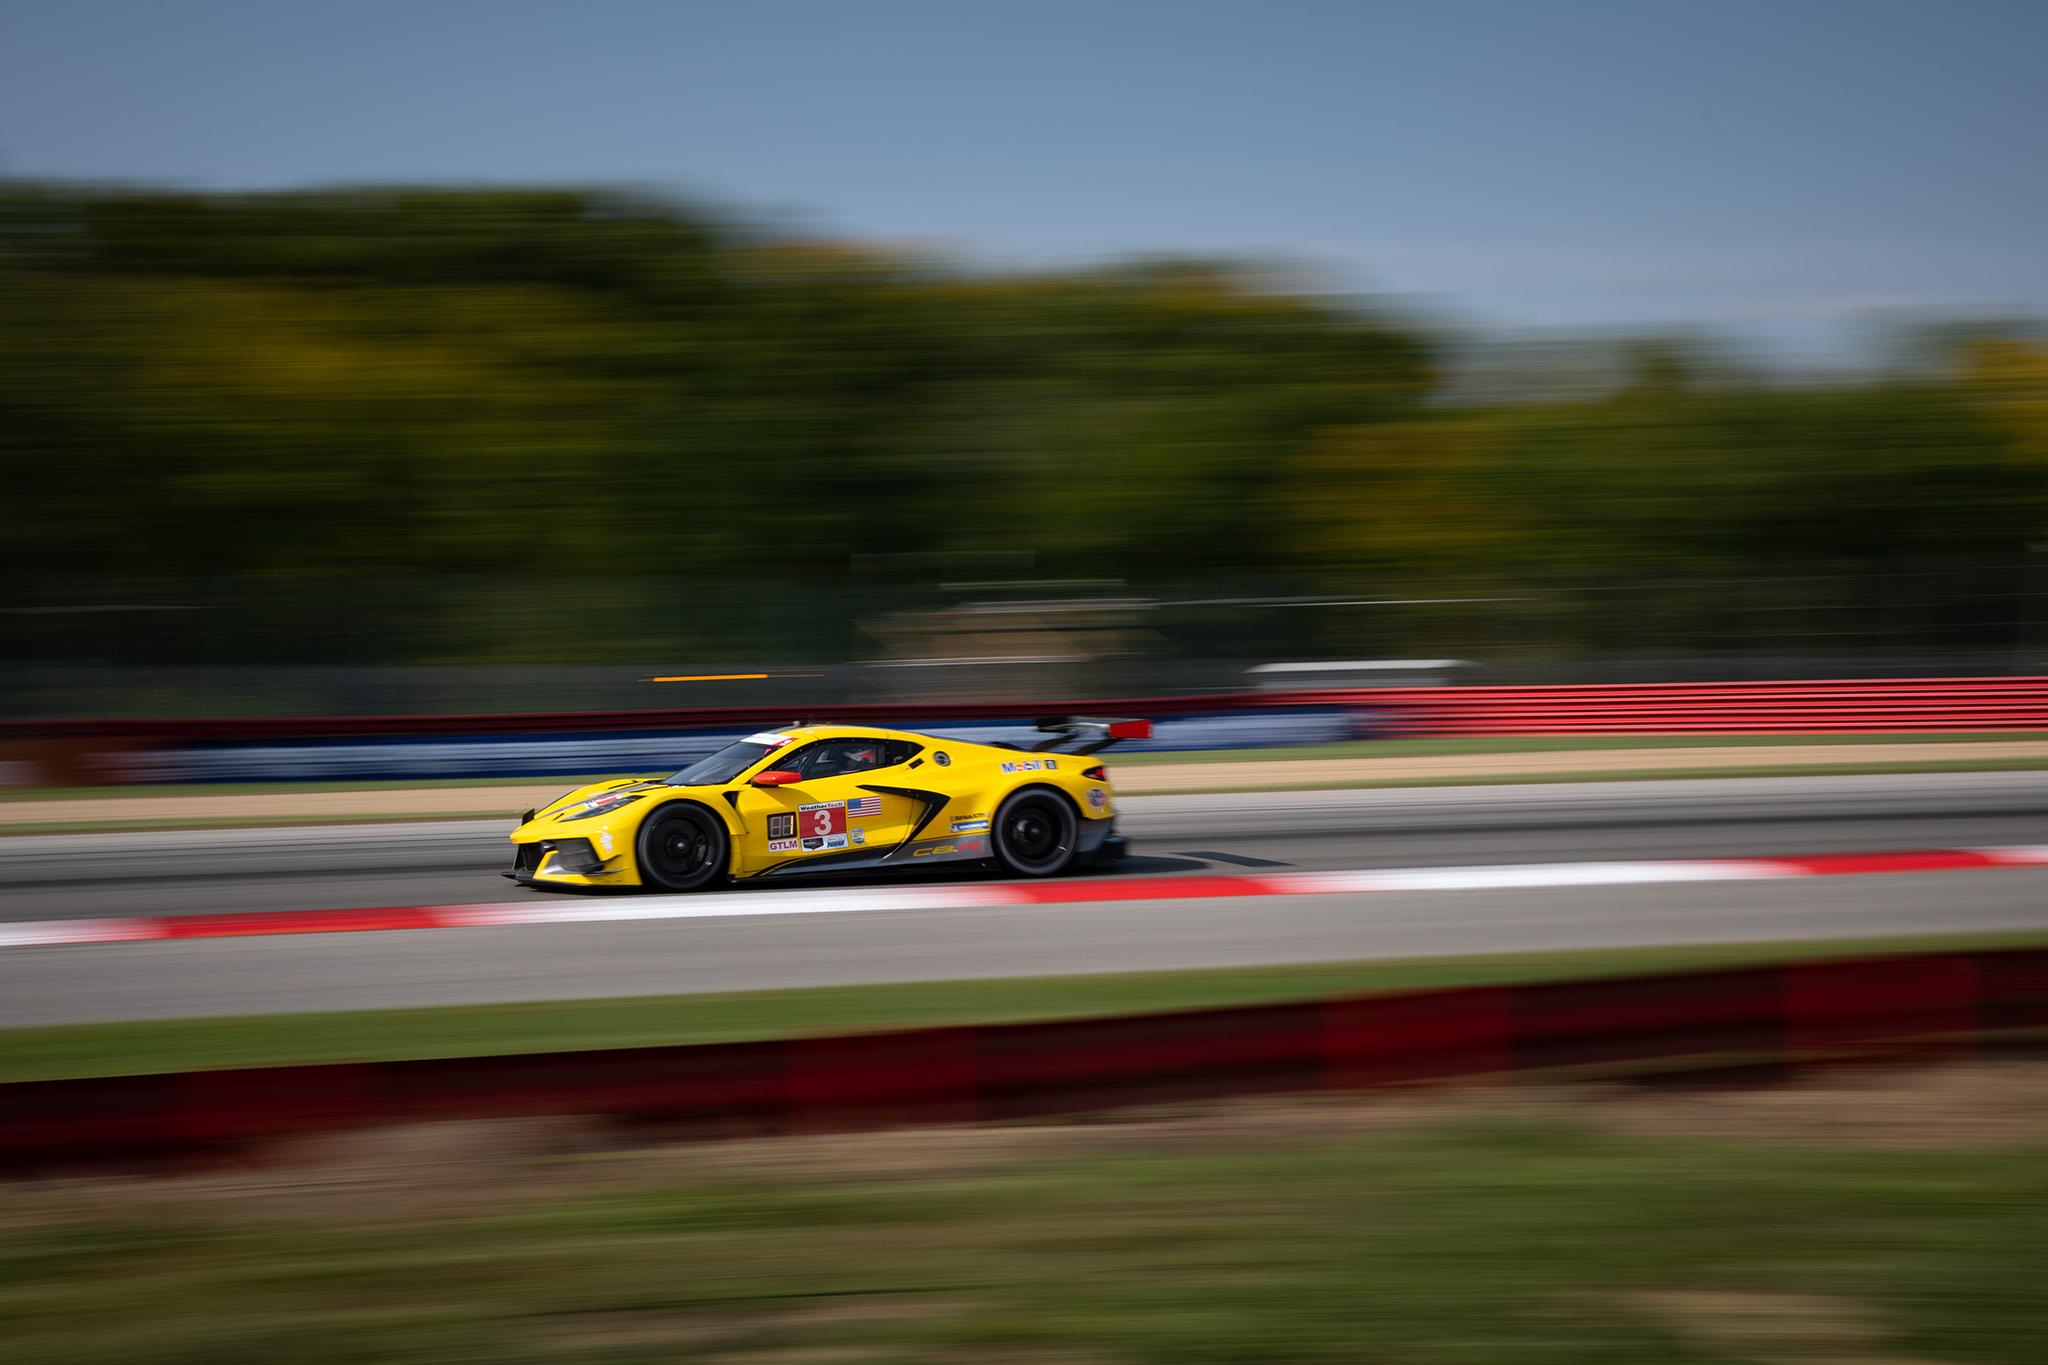 Jordan Taylor and the Corvette Racing C8.R at IMSA Mid Ohio 2020, motorsports photography by Luke Munnell